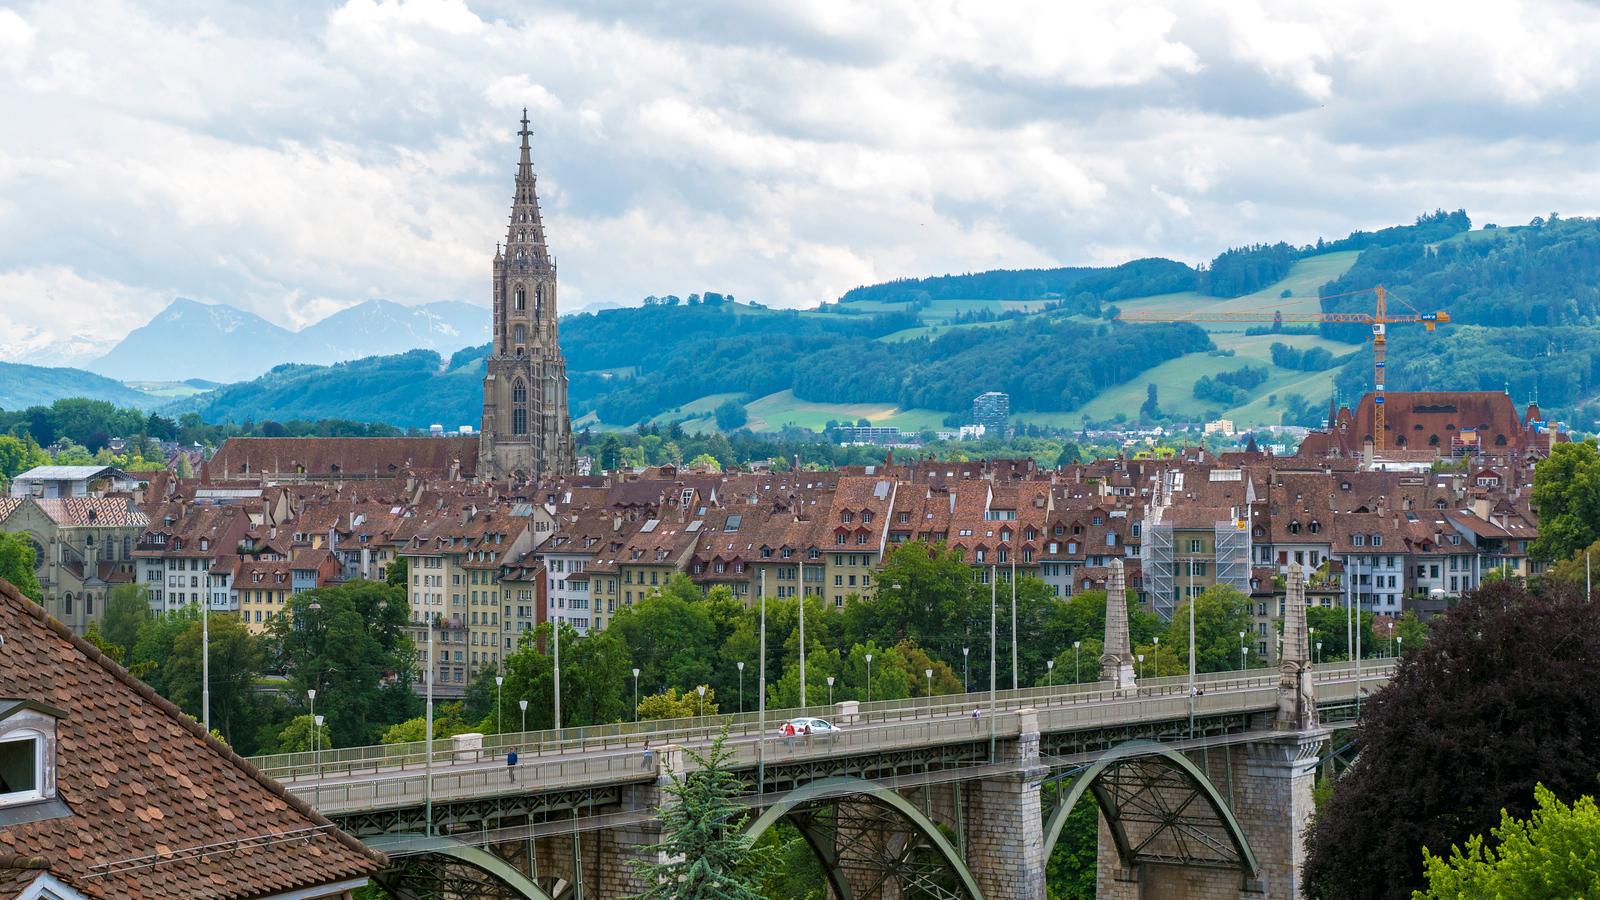 Experience the Luxurious Hotel Allegro Bern, Switzerland